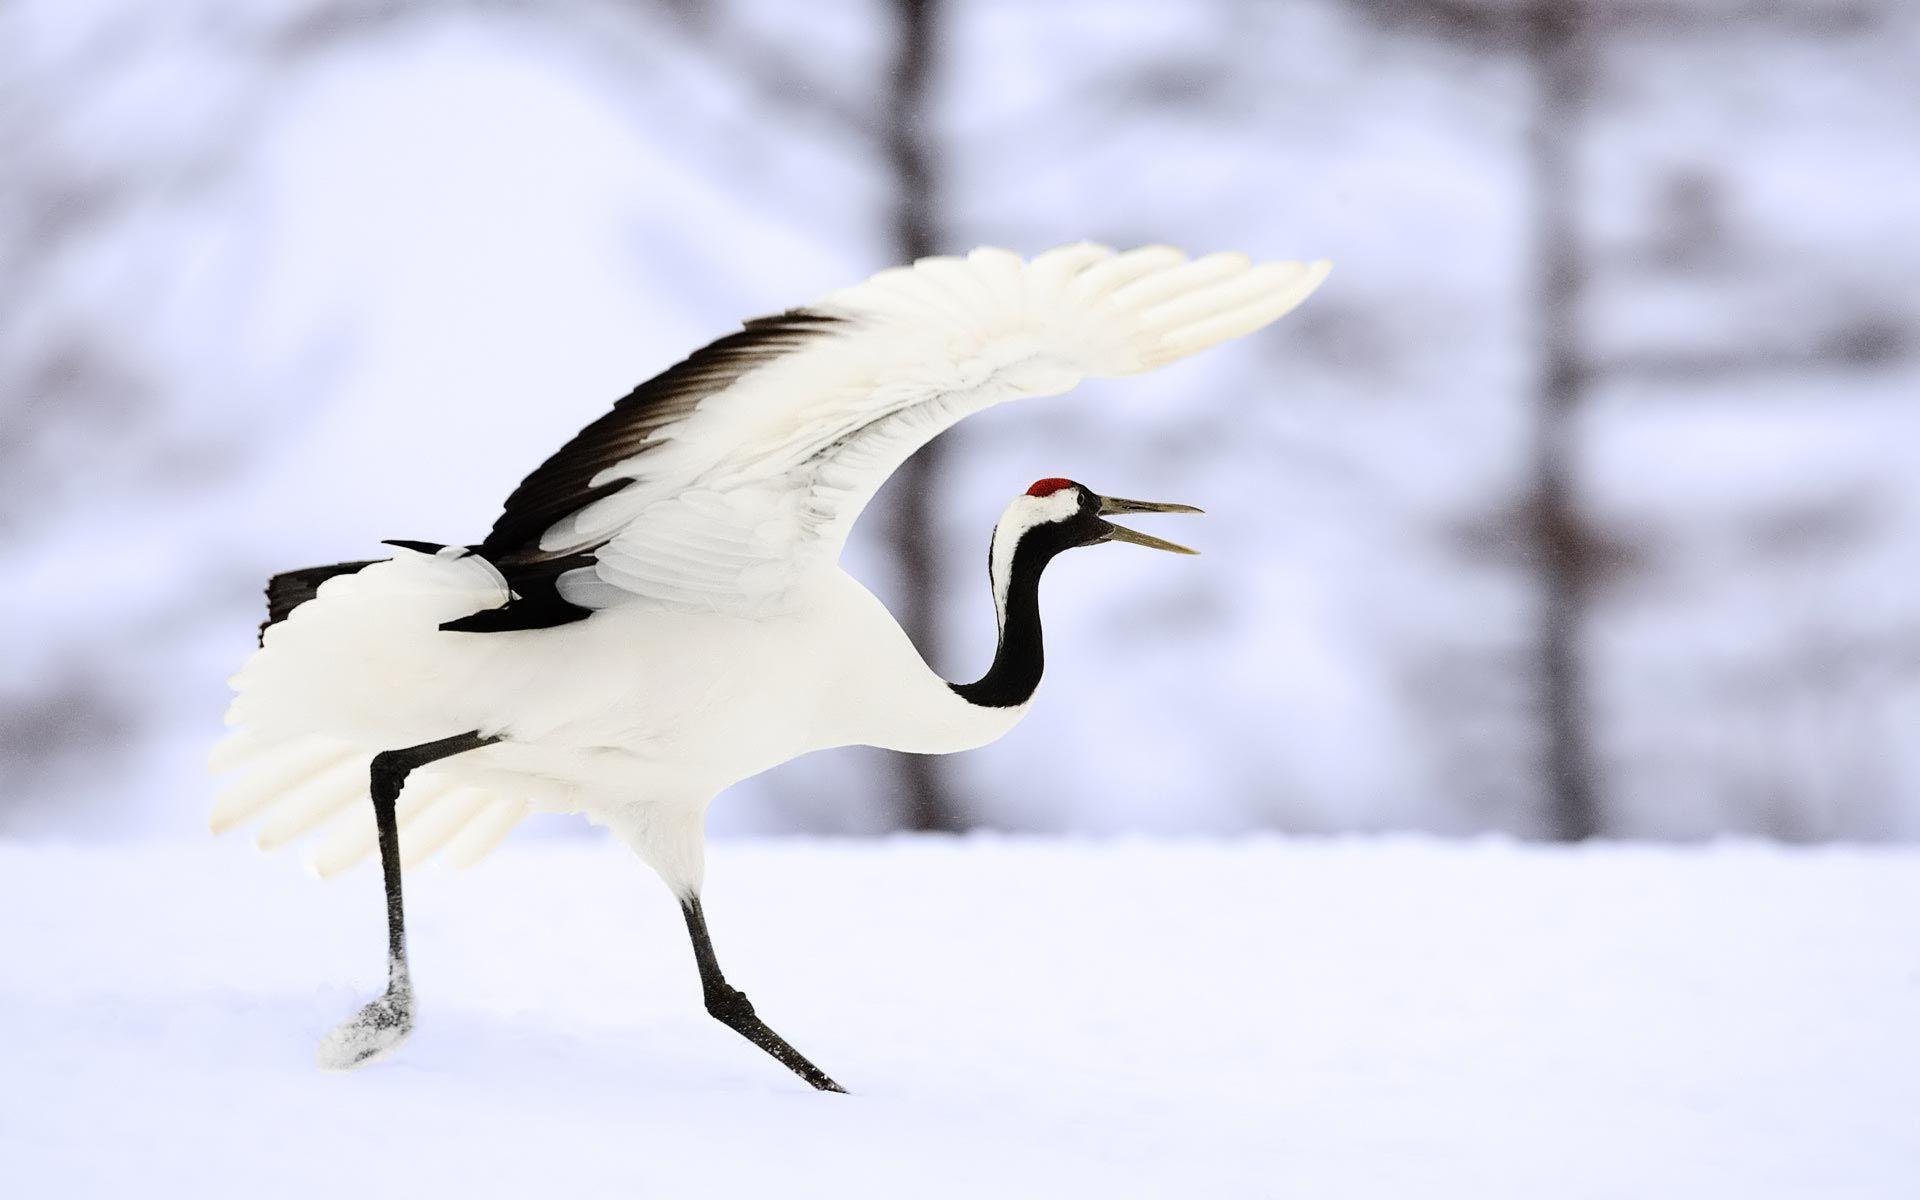 Japanese Crane Birds Wallpapers Top Free Japanese Crane Birds Backgrounds Wallpaperaccess